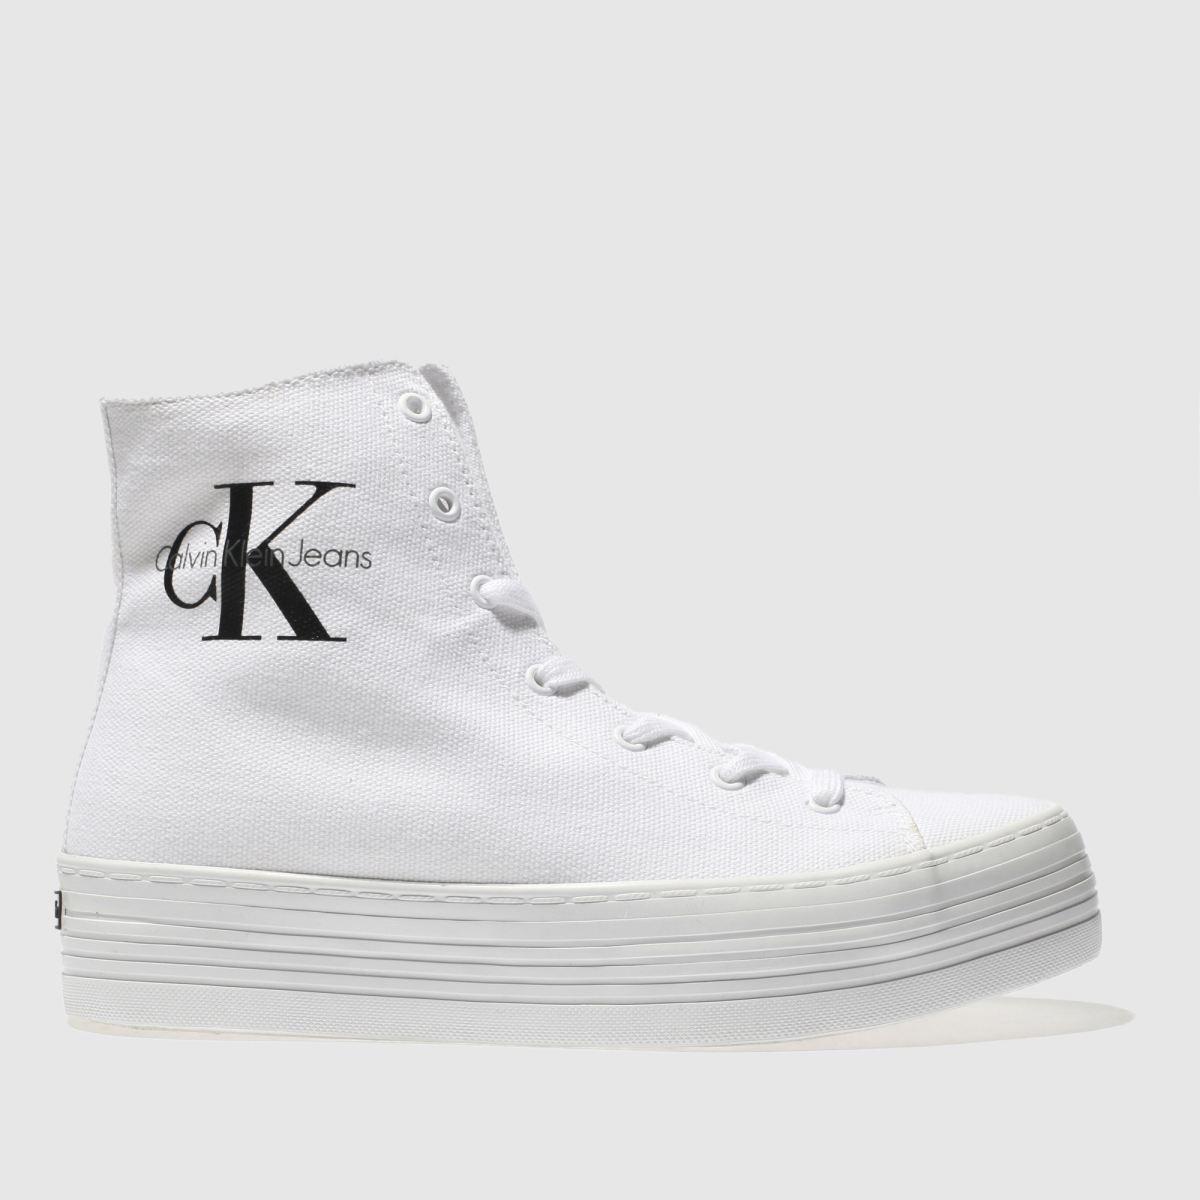 Calvin Klein White & Black Jeans Zabrina Canvas Trainers